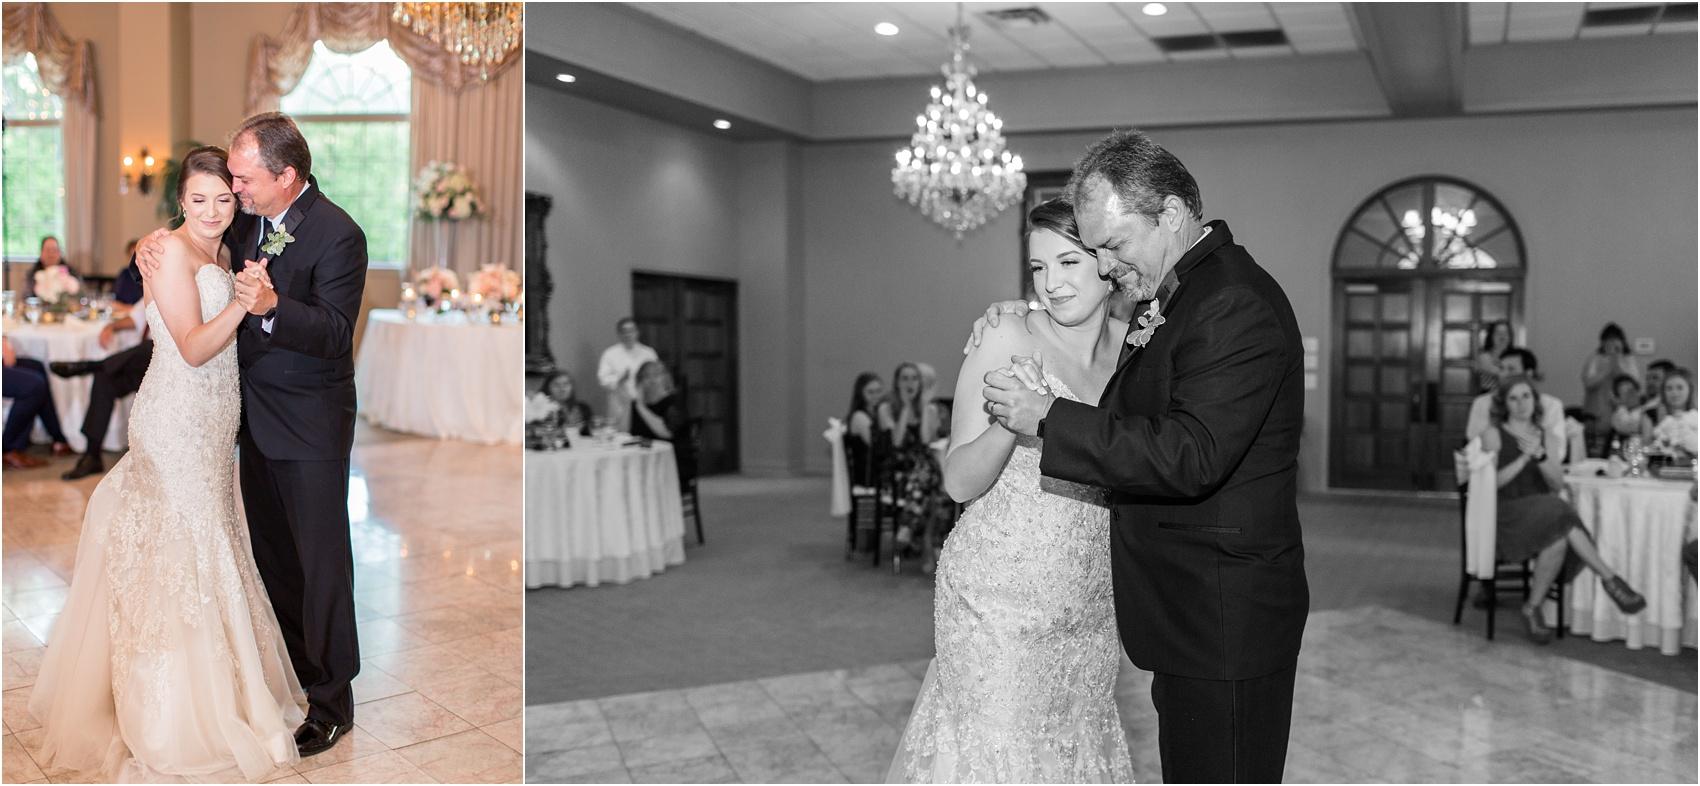 Savannah Eve Photography- Nutt Wedding- Blog-113.jpg